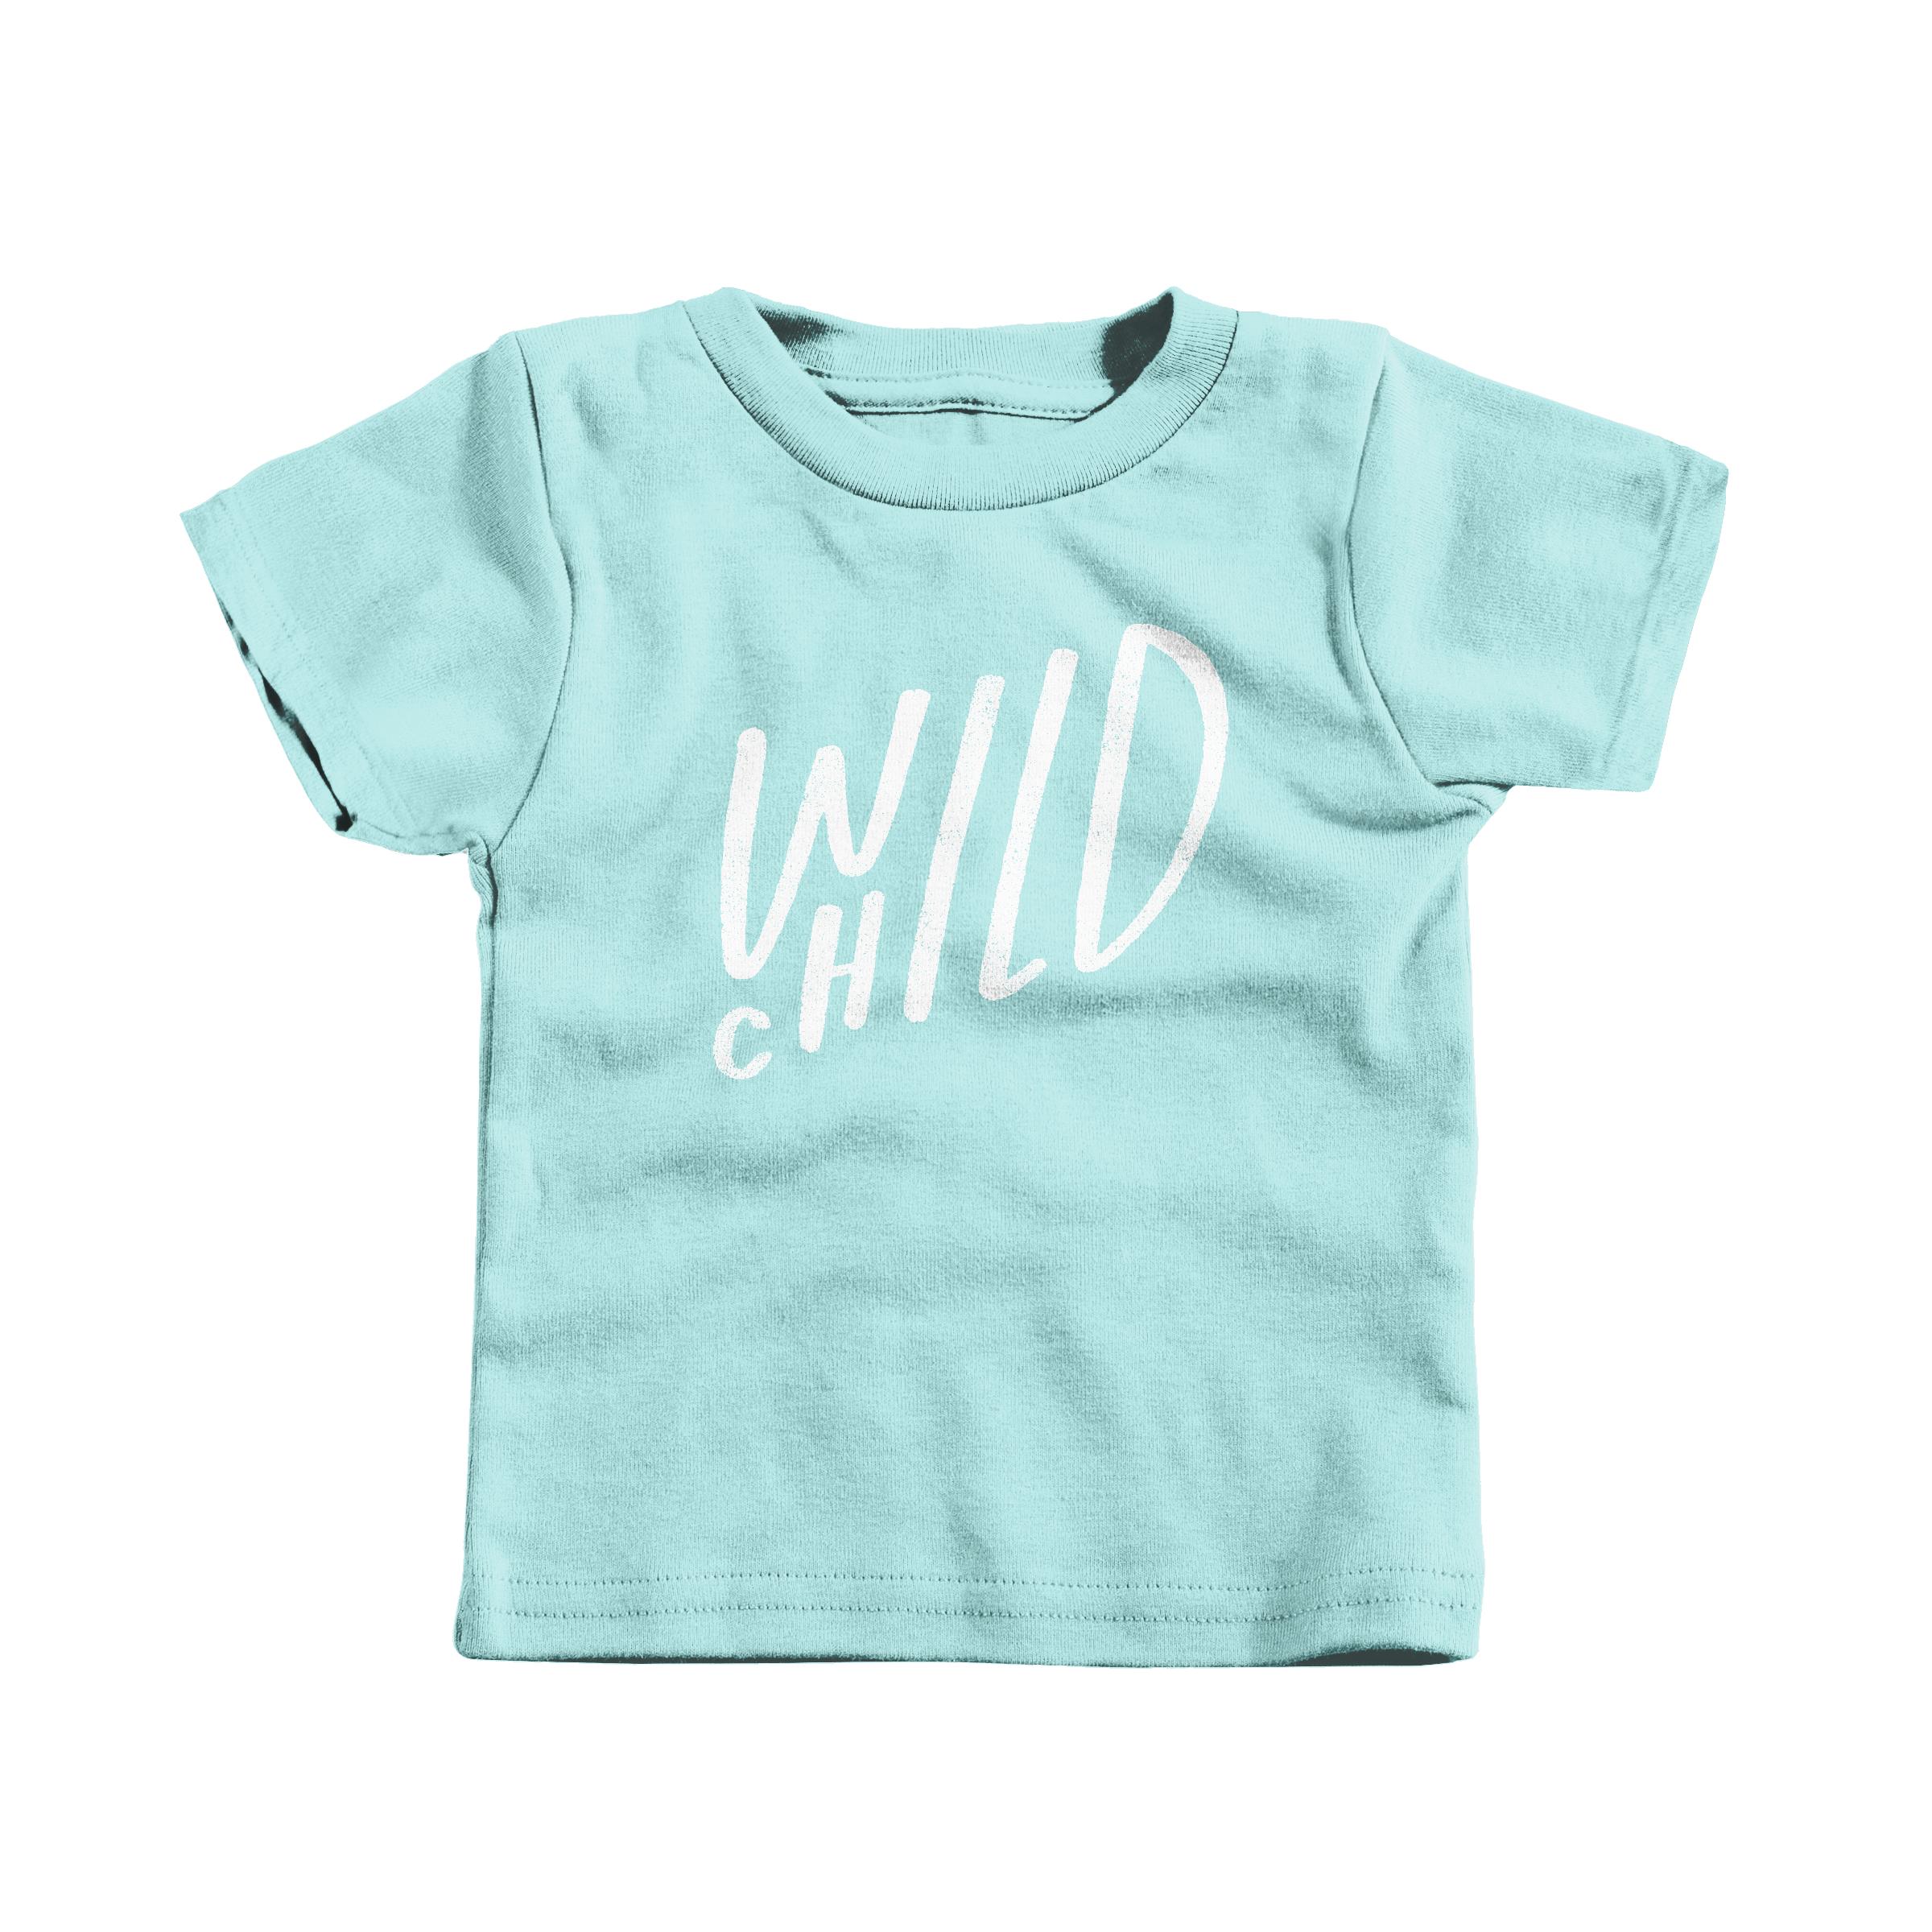 Wild Child Chill (T-Shirt)